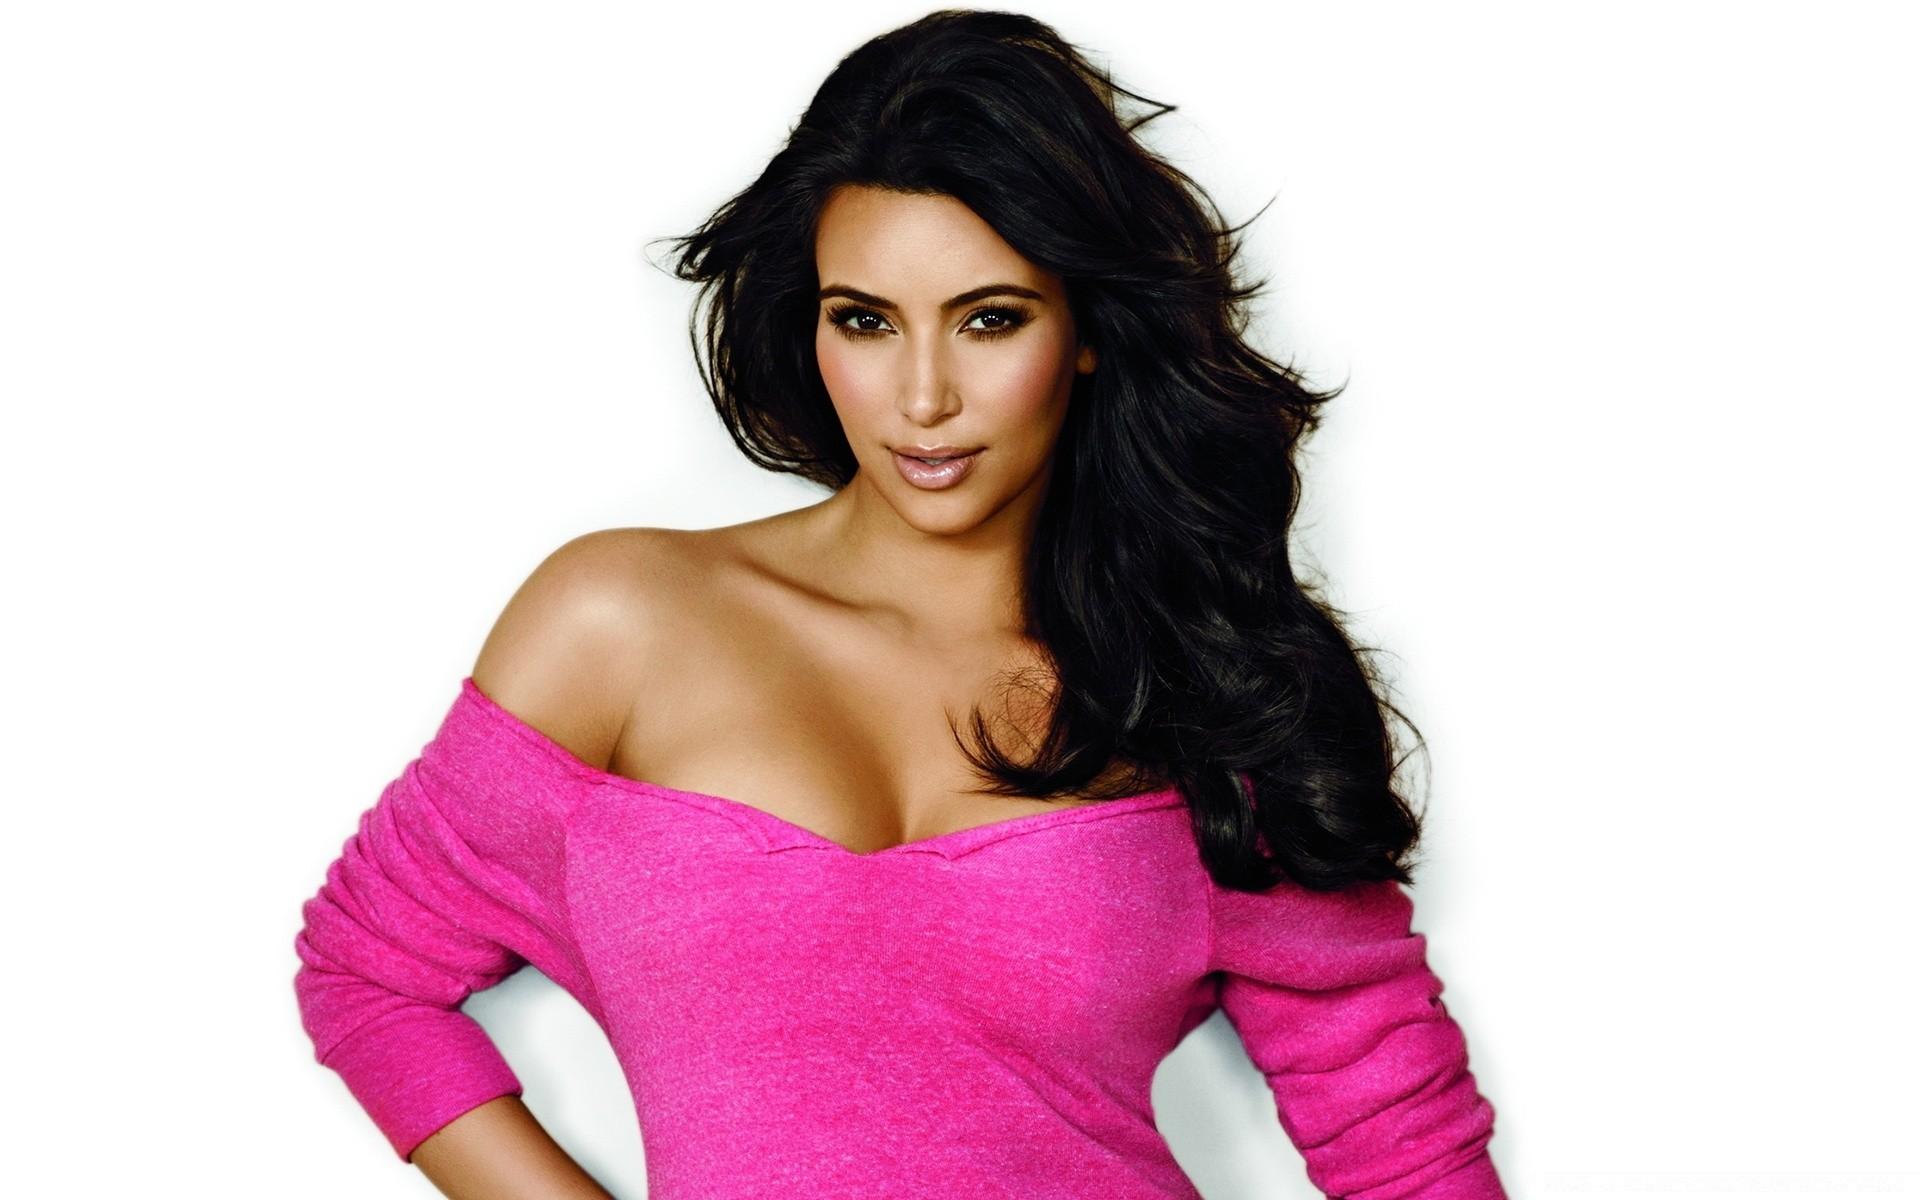 kim kardashin Описание присоединяйтесь к звездным приключениям kim kardashian в игре kim kardashian: hollywood.